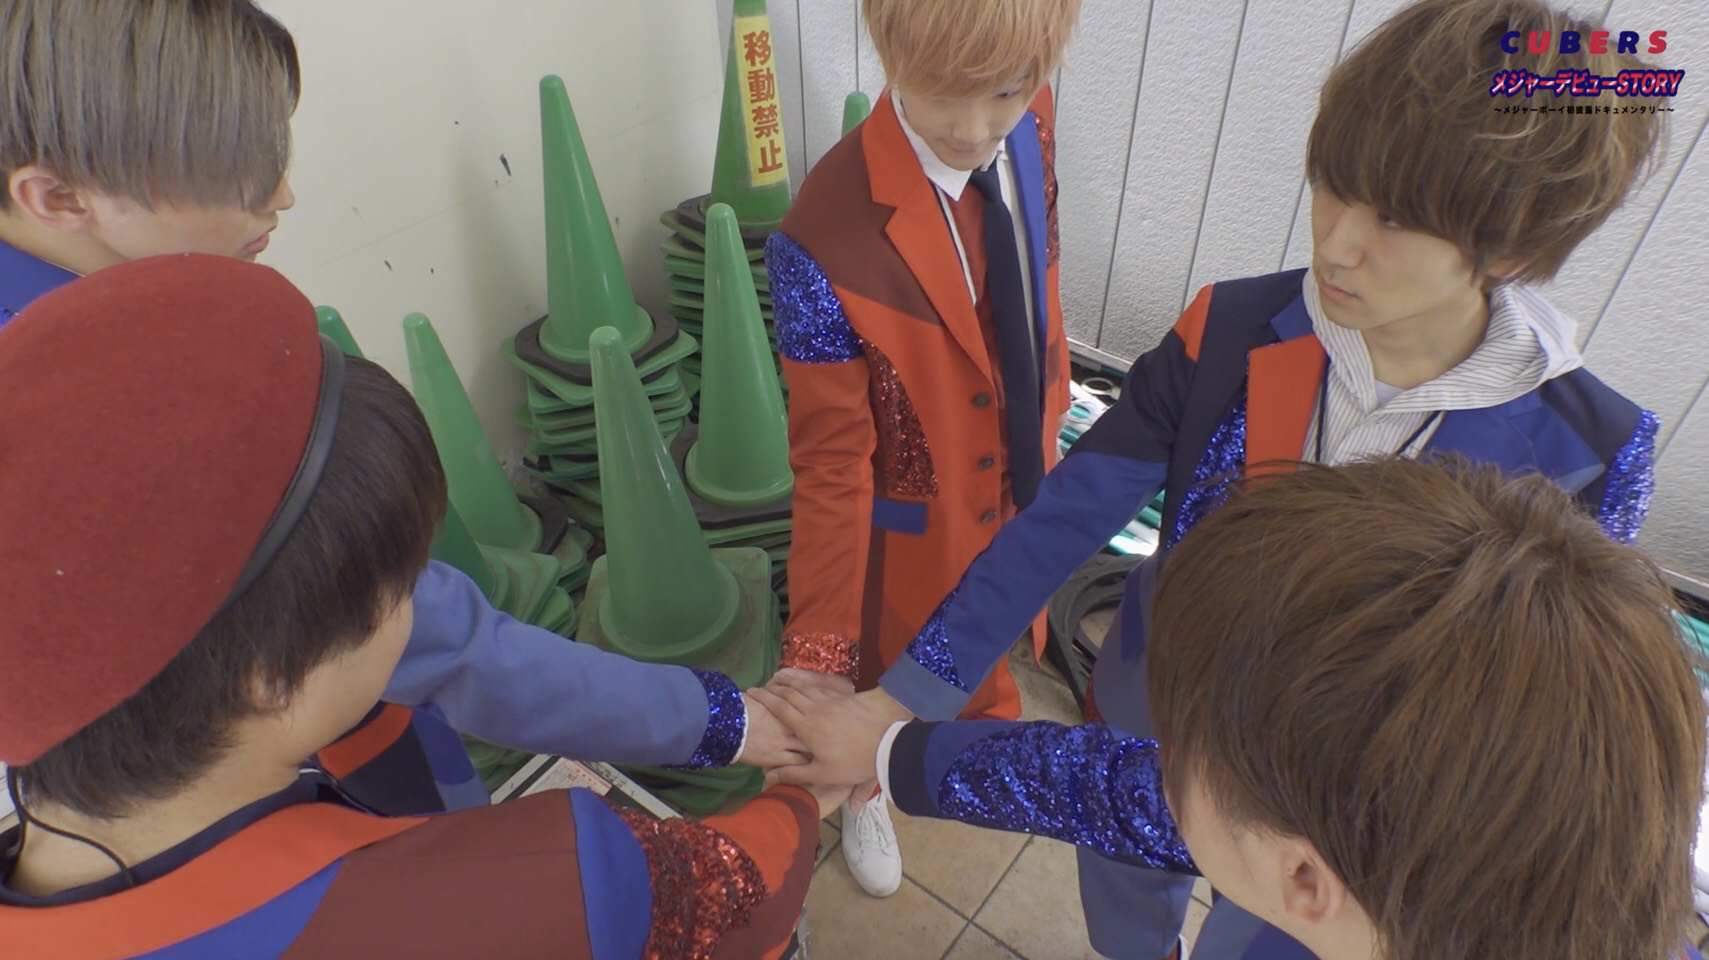 【NEWS】密着動画『メジャーデビューSTORY 〜メジャーボーイ初披露ドキュメンタリー 〜』の映像公開!